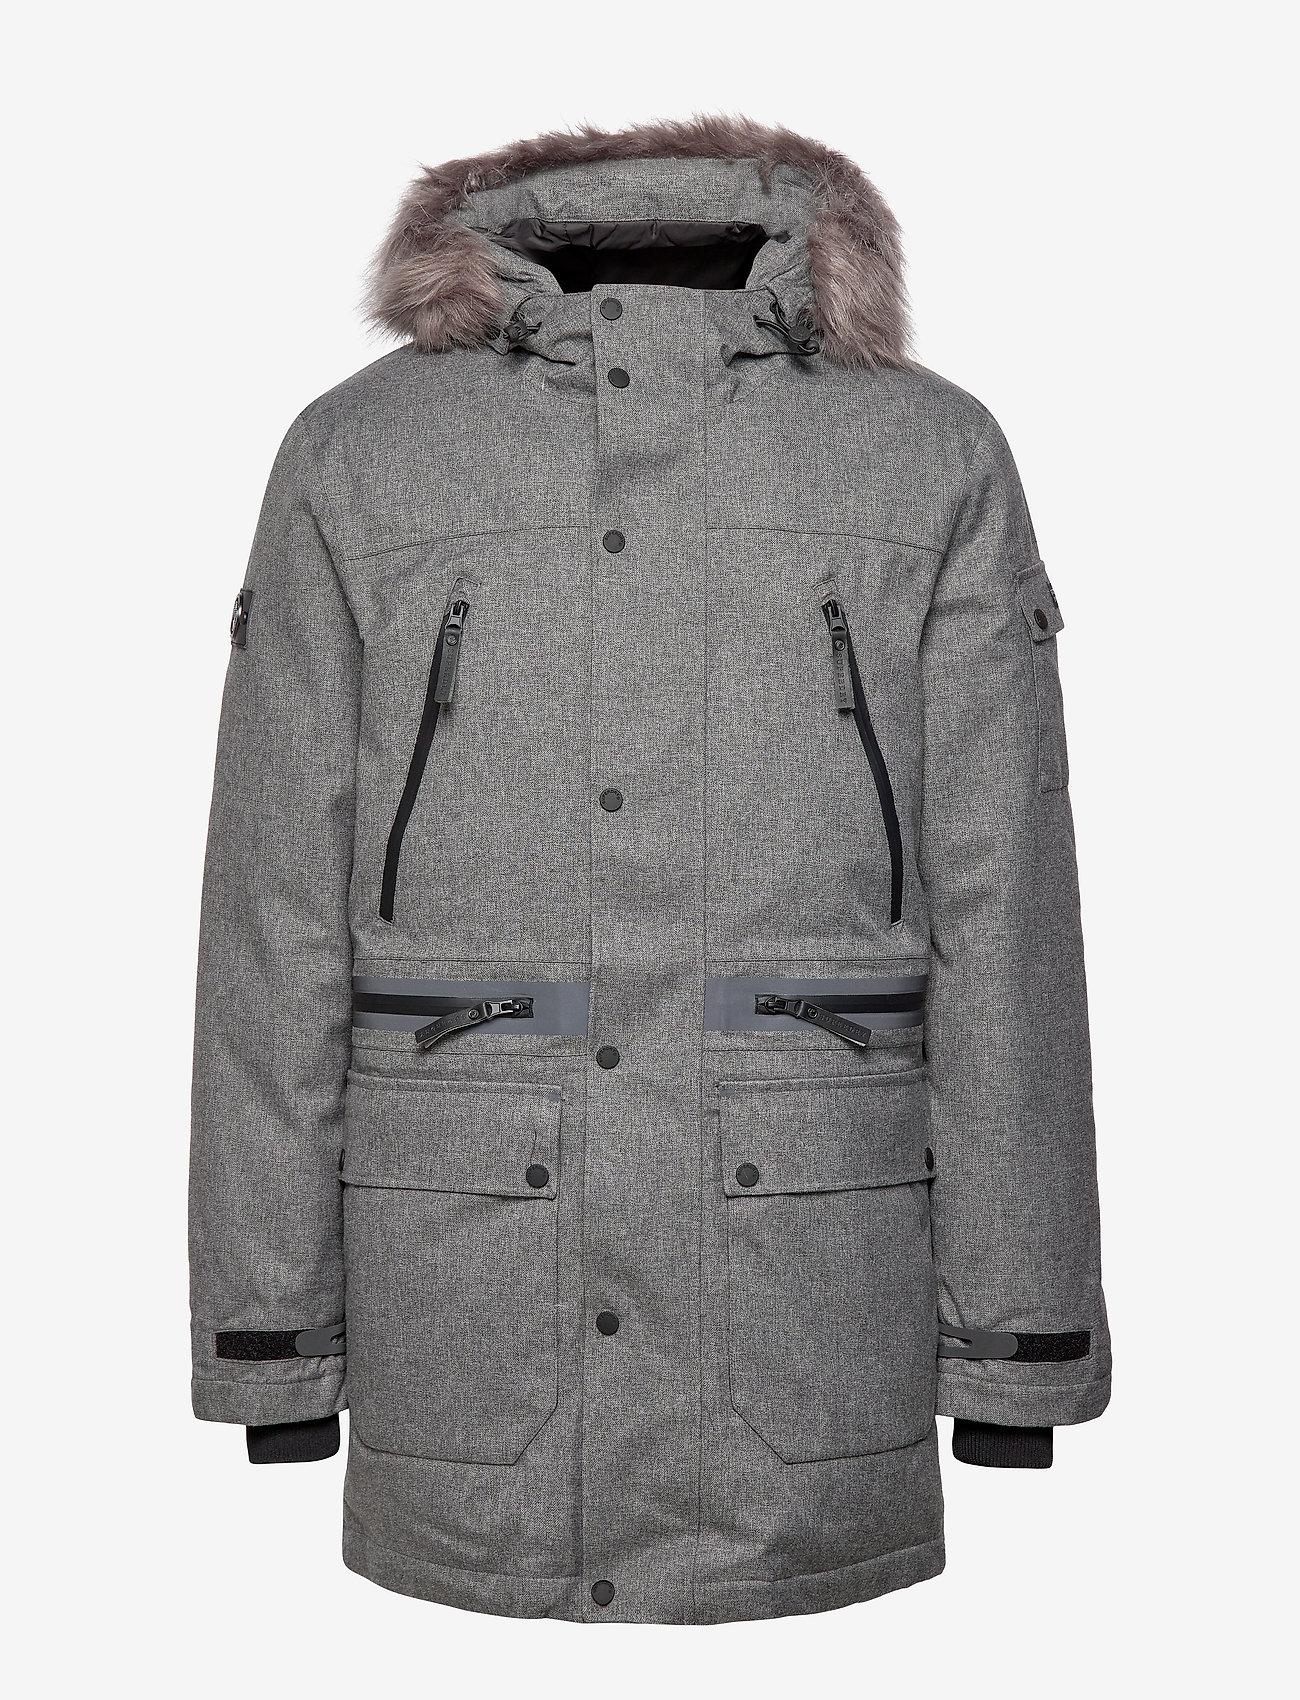 Superdry Waterproof Premium Ultimate Down Parka - Jackets & Coats